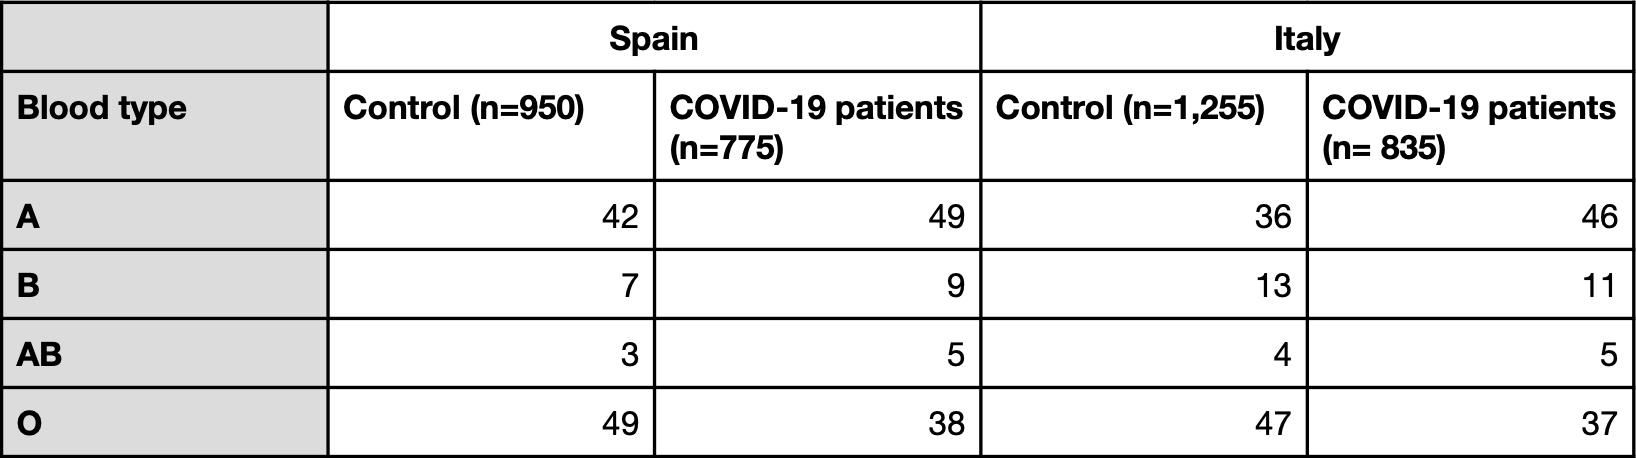 Blood type prevalence in Ellinghaus et al.